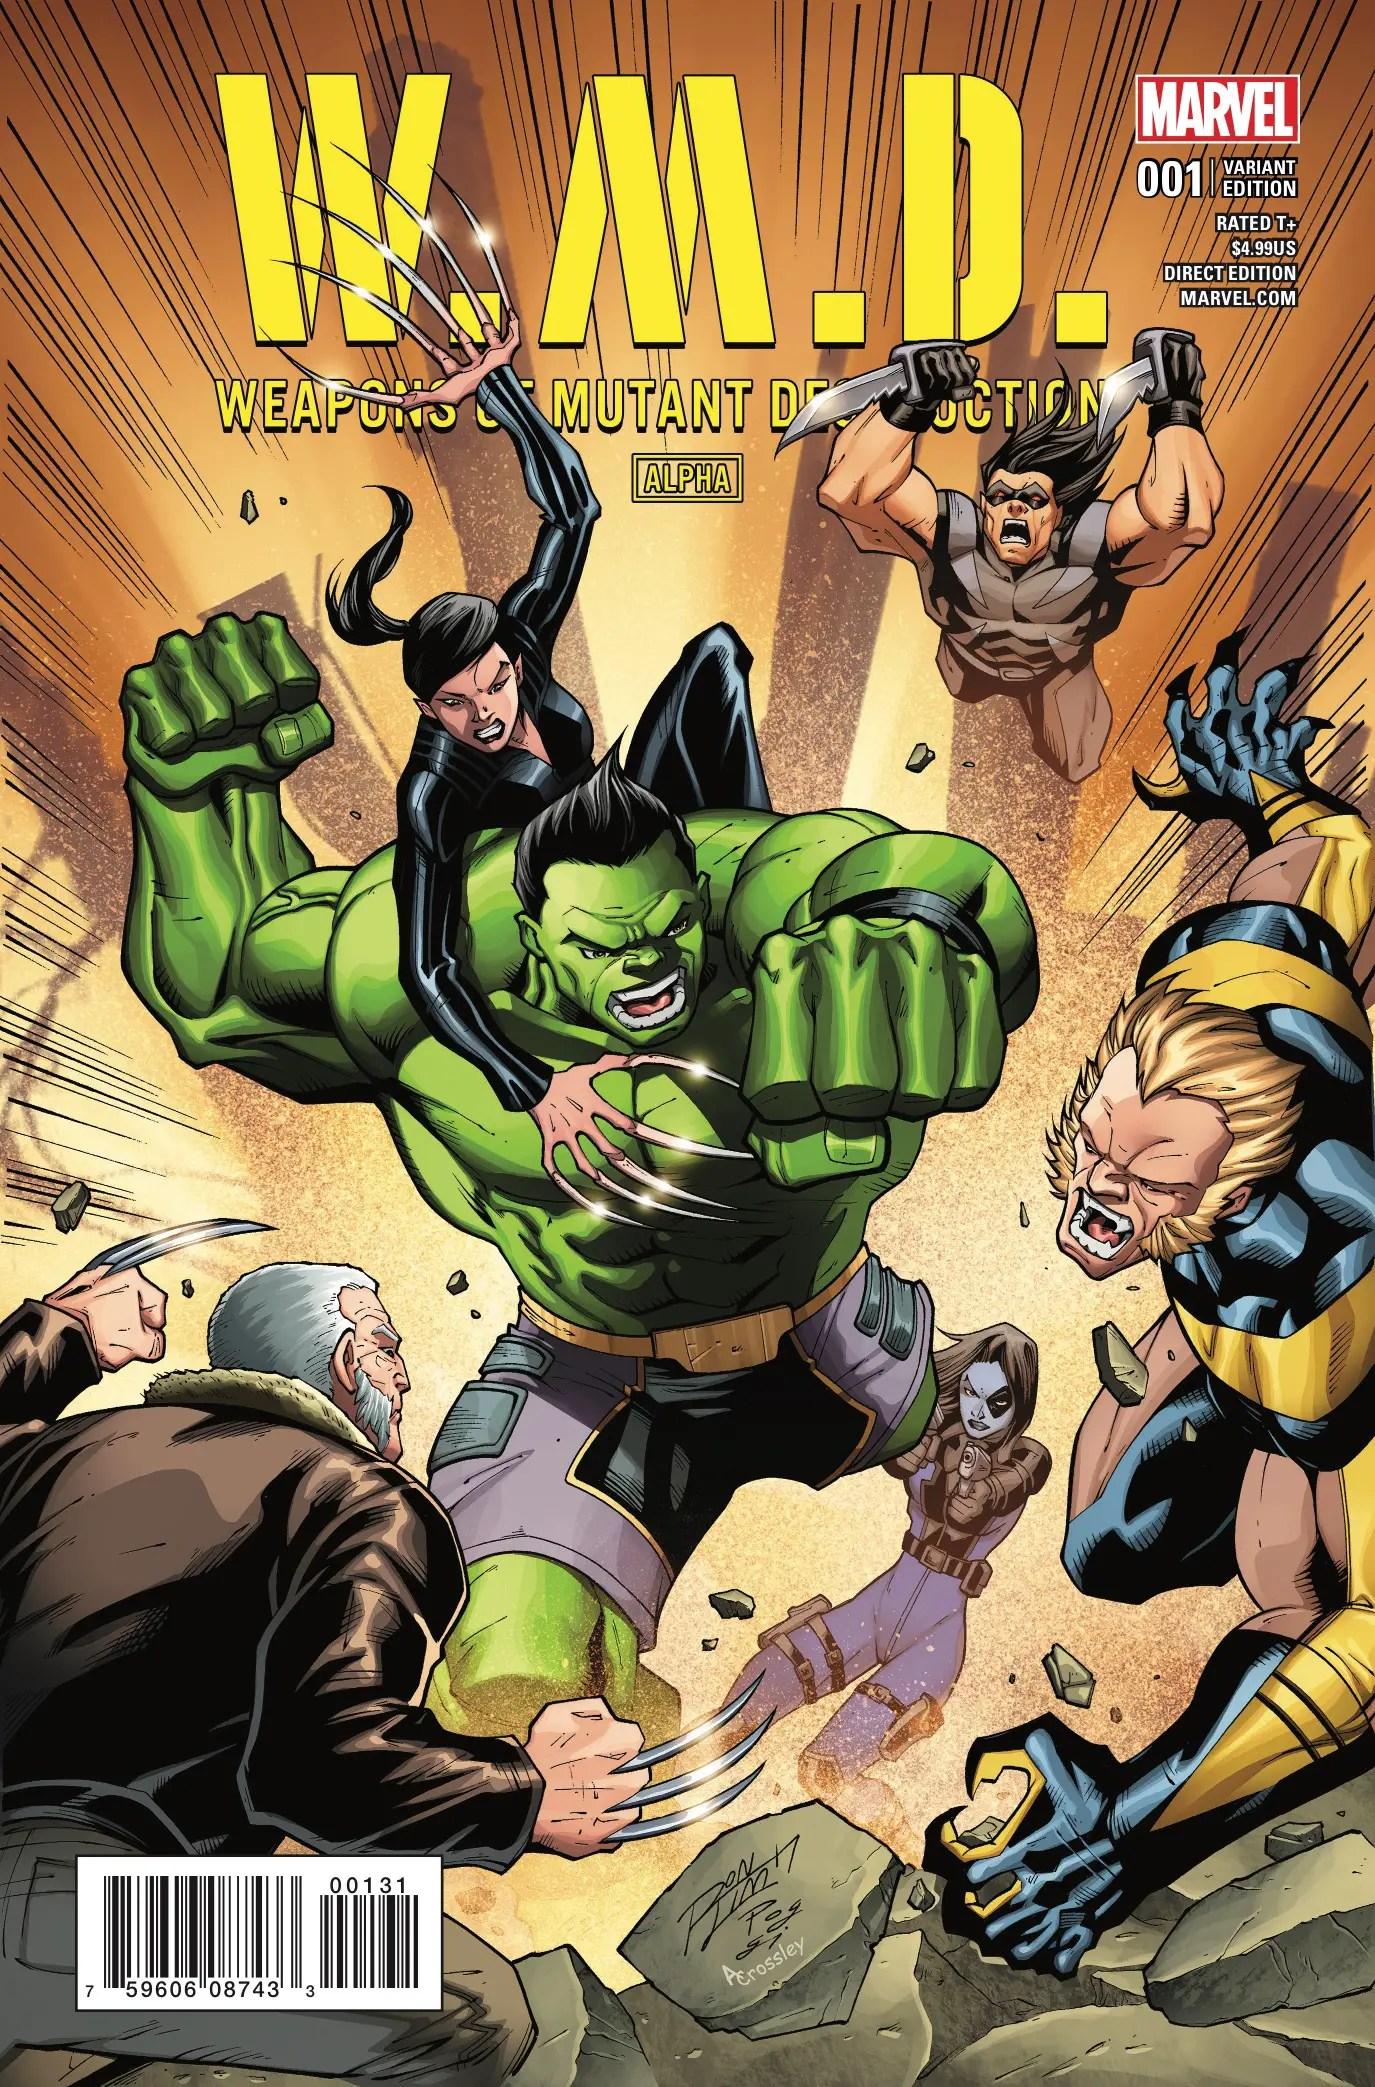 Weapons of Mutant Destruction #1 Review